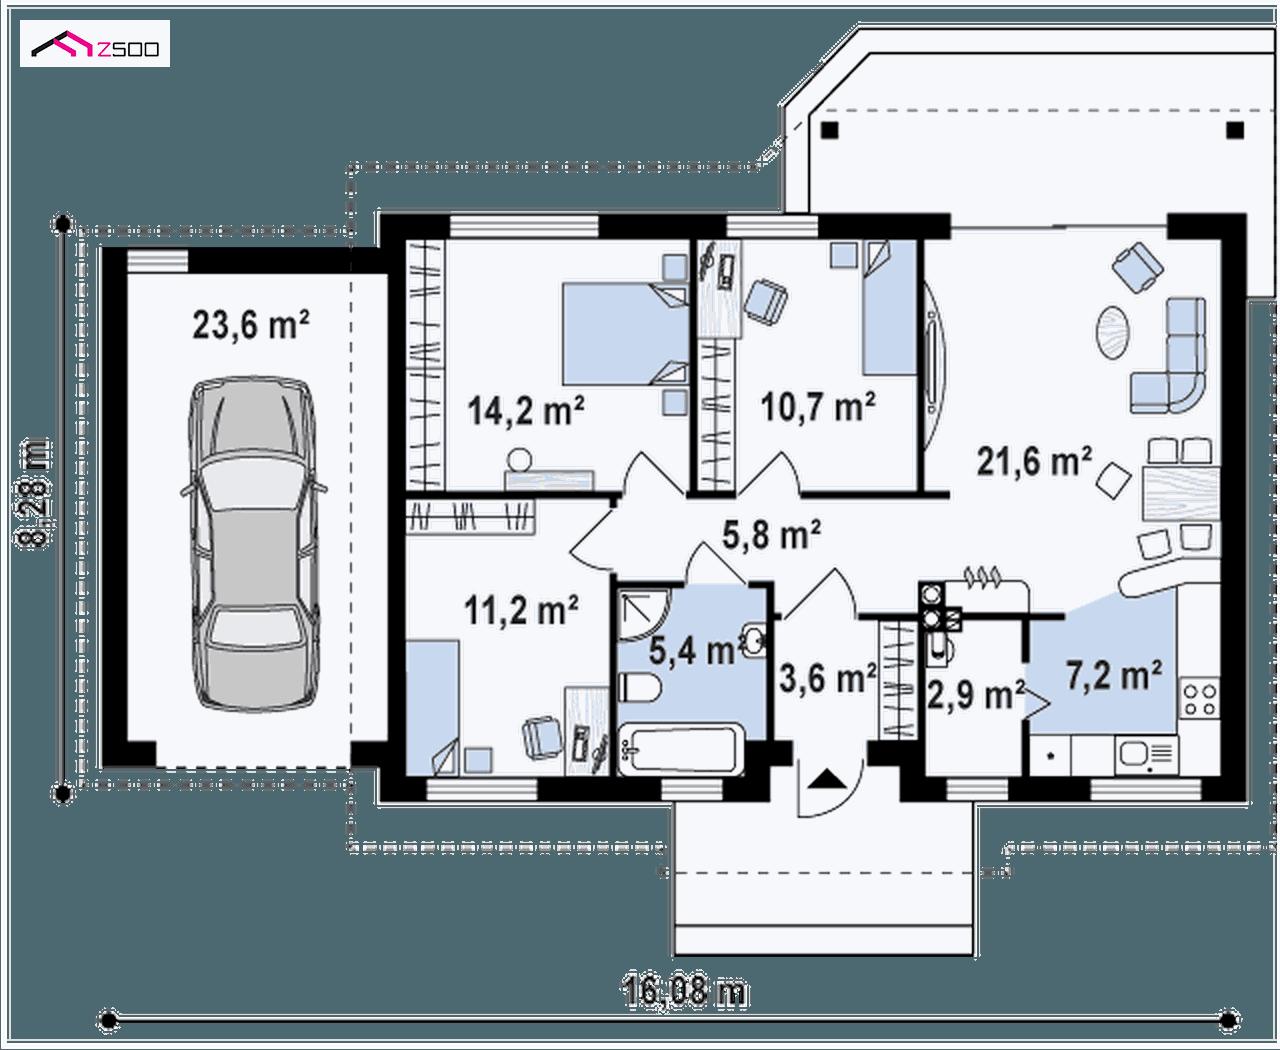 Z7 d gp in 2019 | small houses | Dream house plans, House ... Z Gl House Plans on biltmore estate elevation plans, vardo camper plans, floating dock plans, new house design plans,